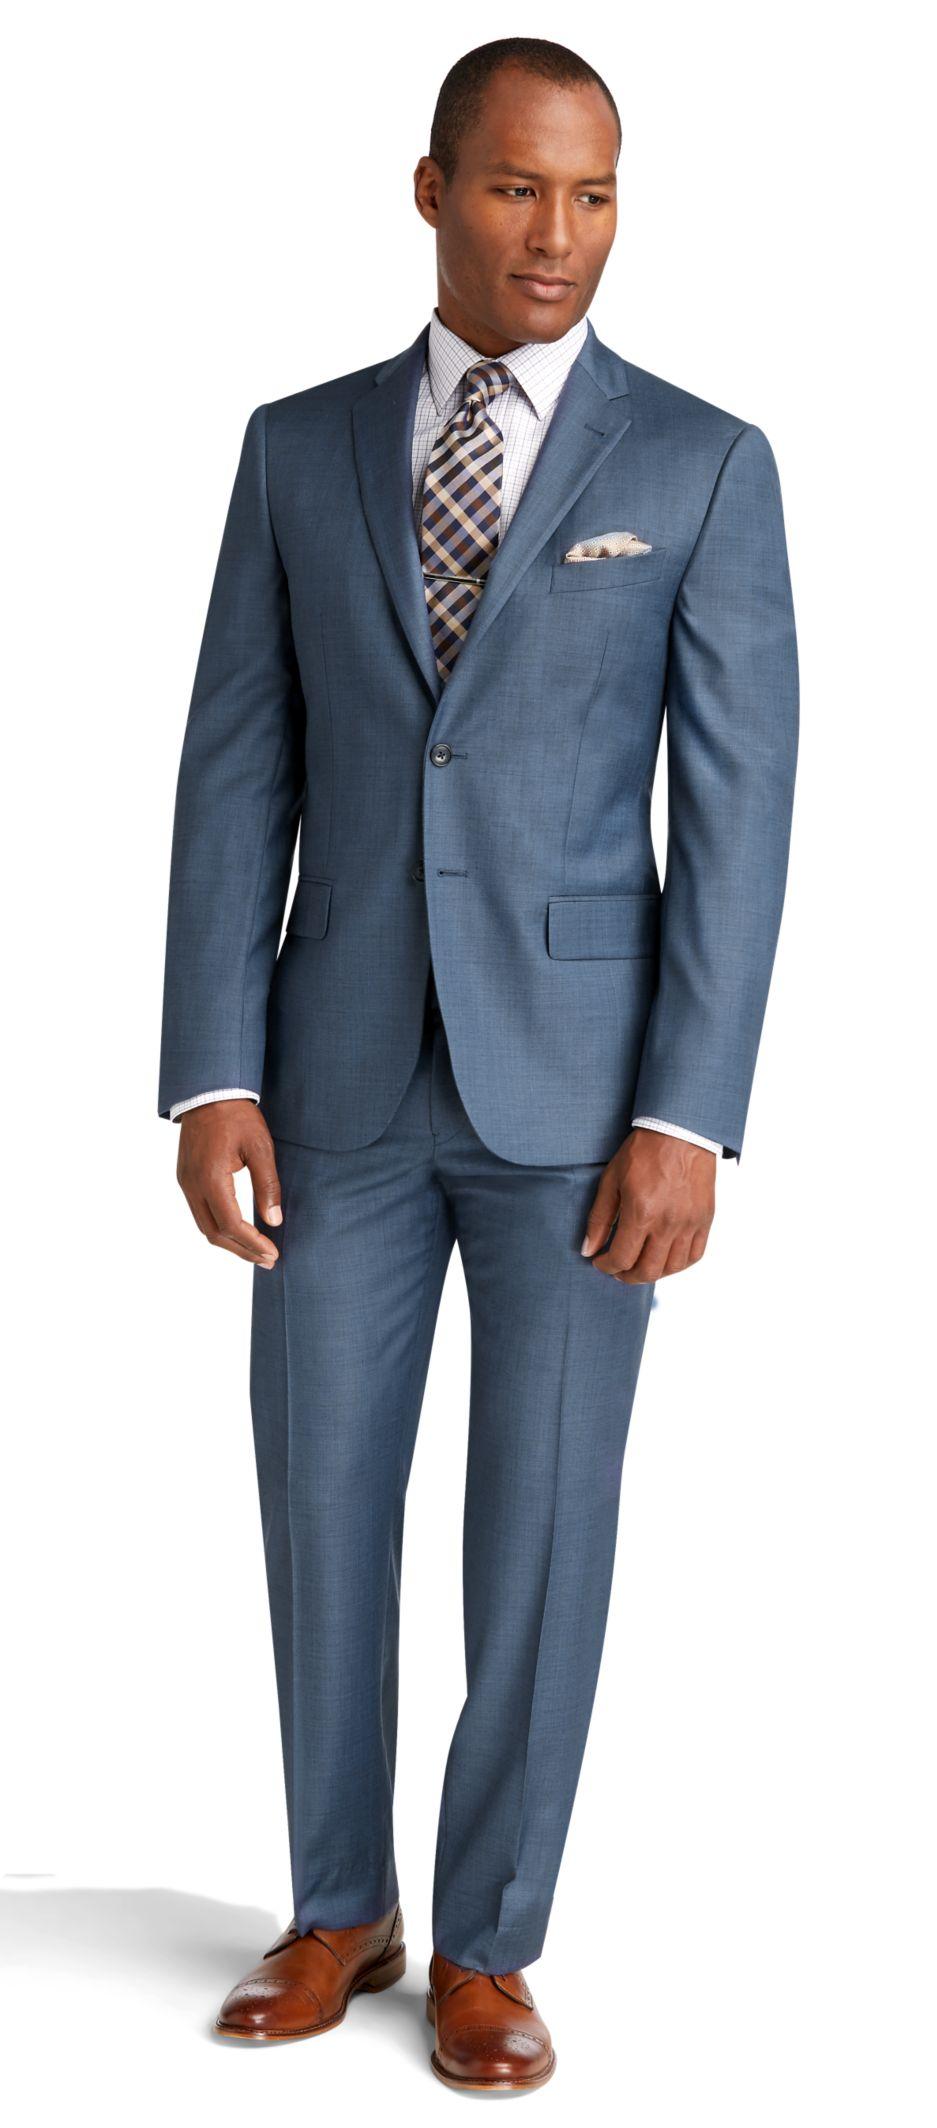 slim fit suits menu0027s suits, reserve collection slim fit sharkskin suit - jos a bank OMFPDGV